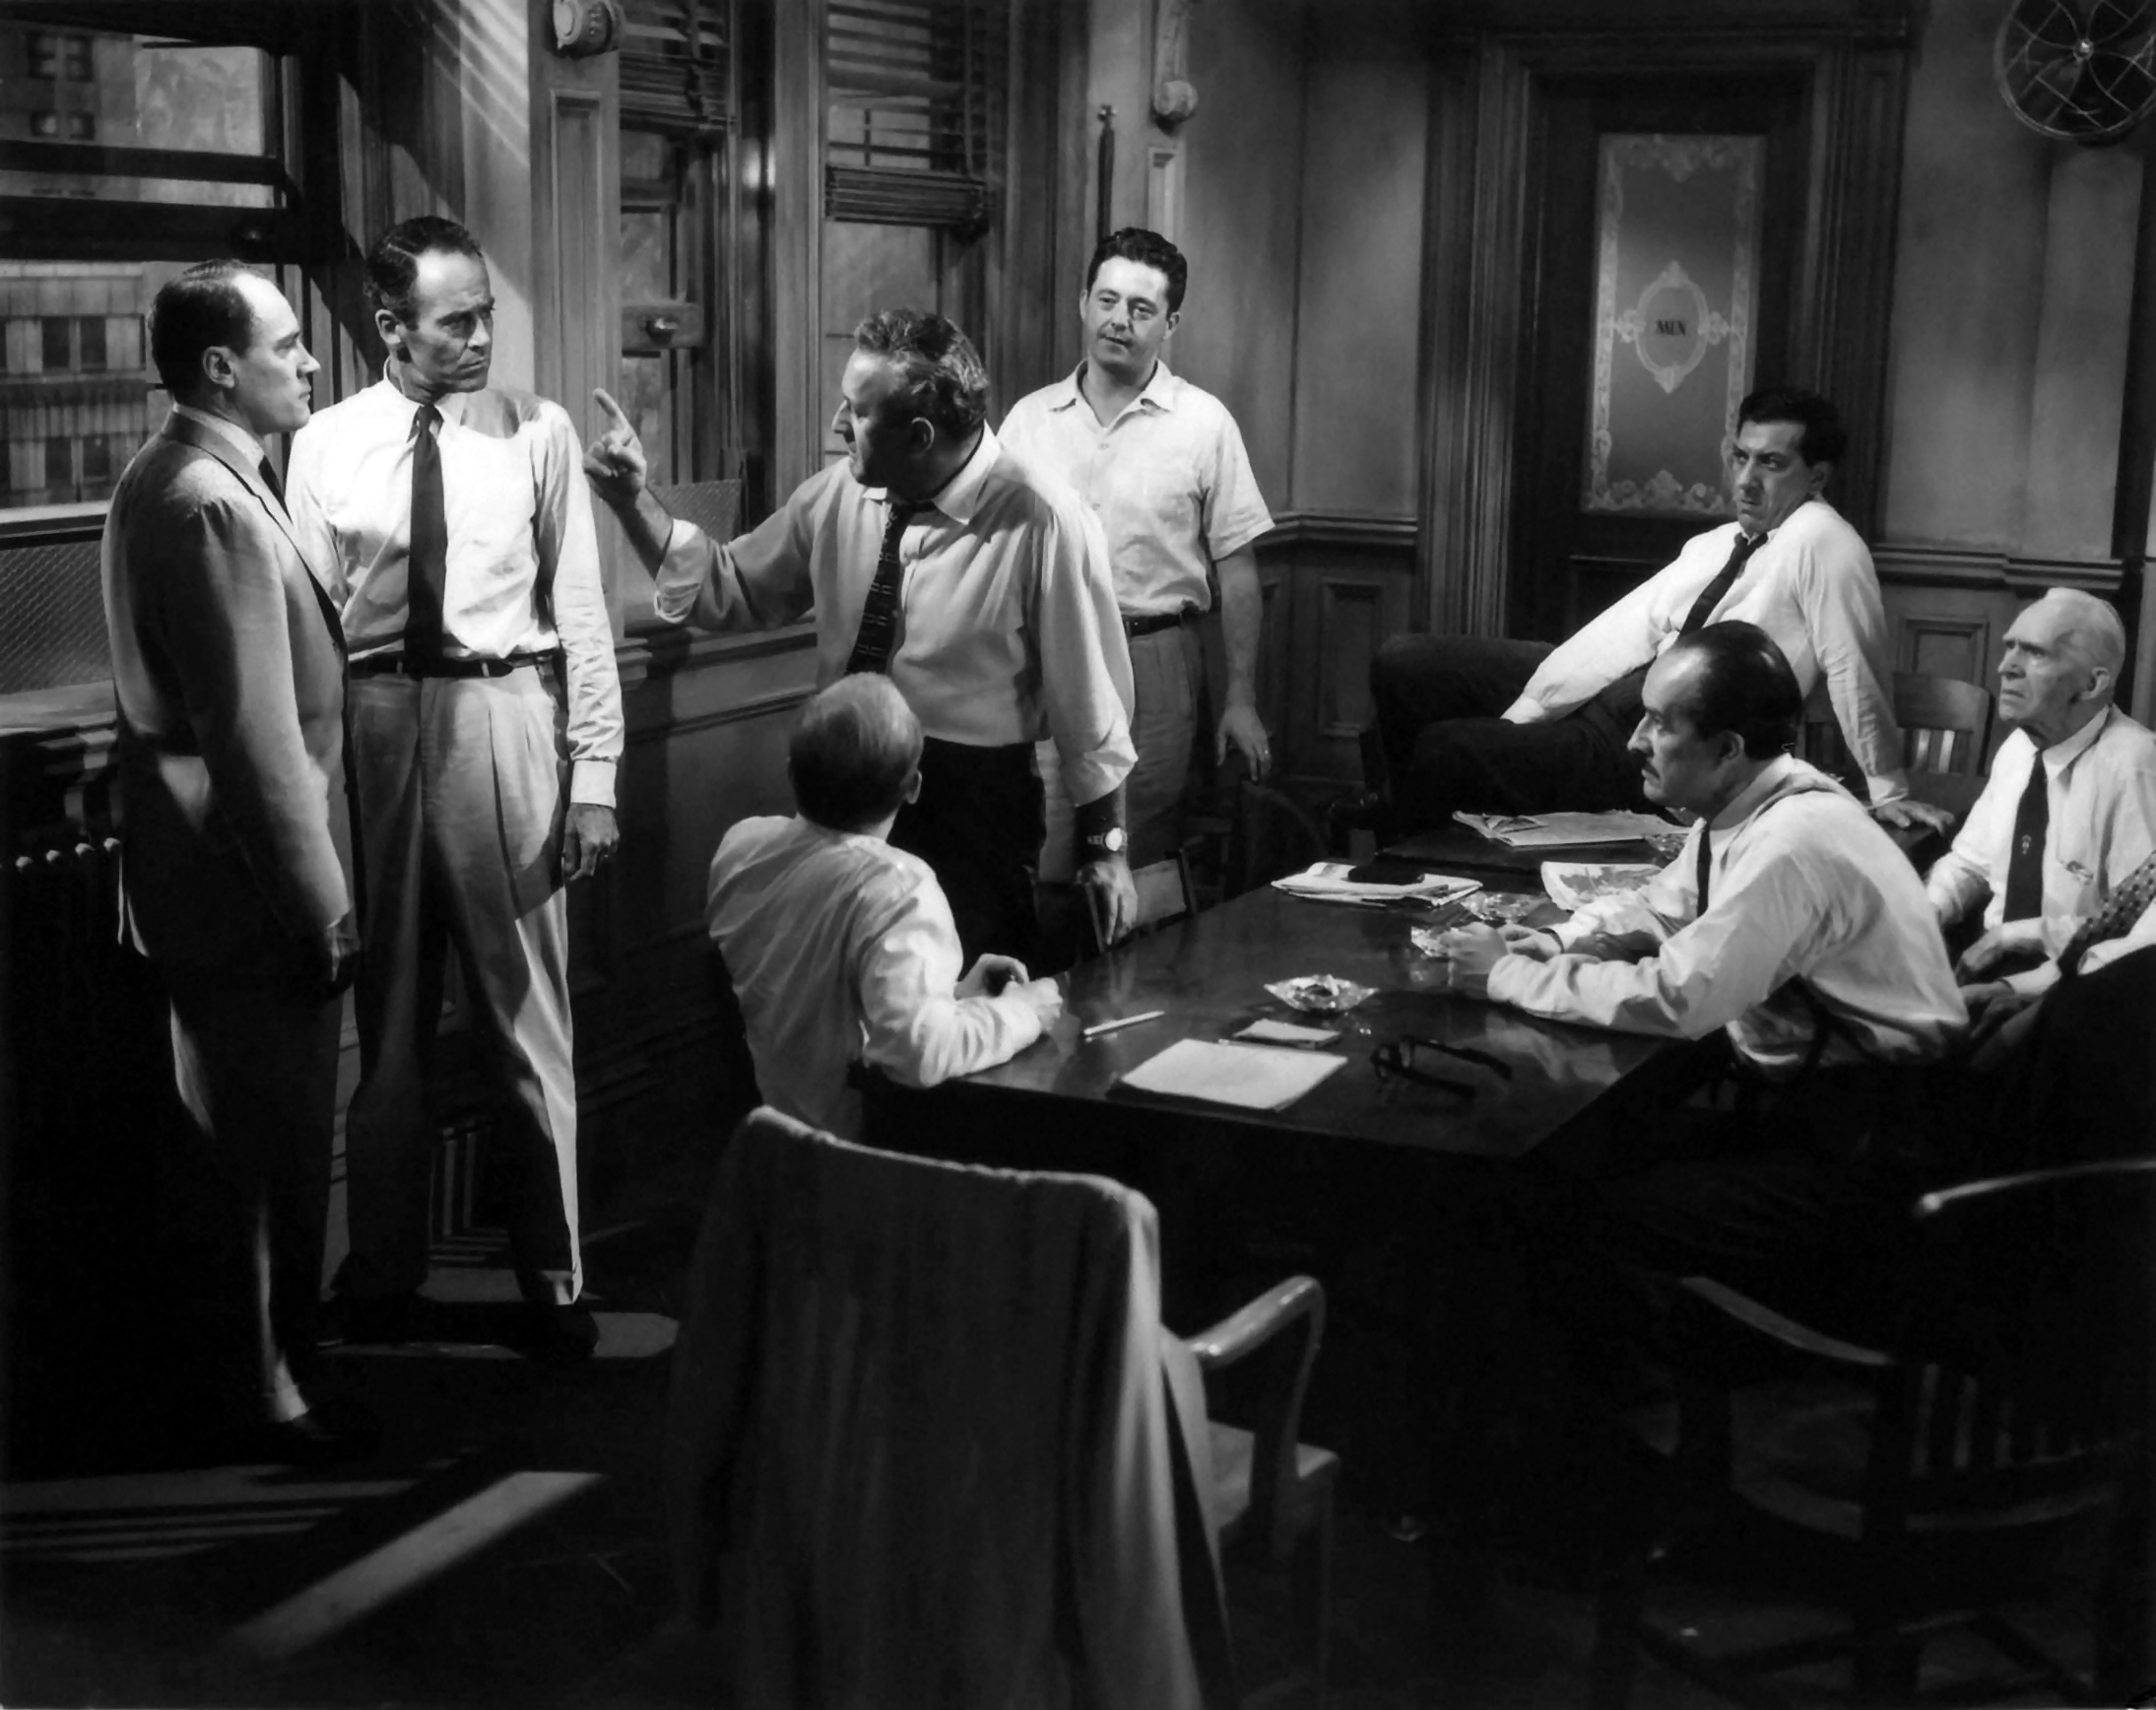 12 angry men reasonable doubt essay